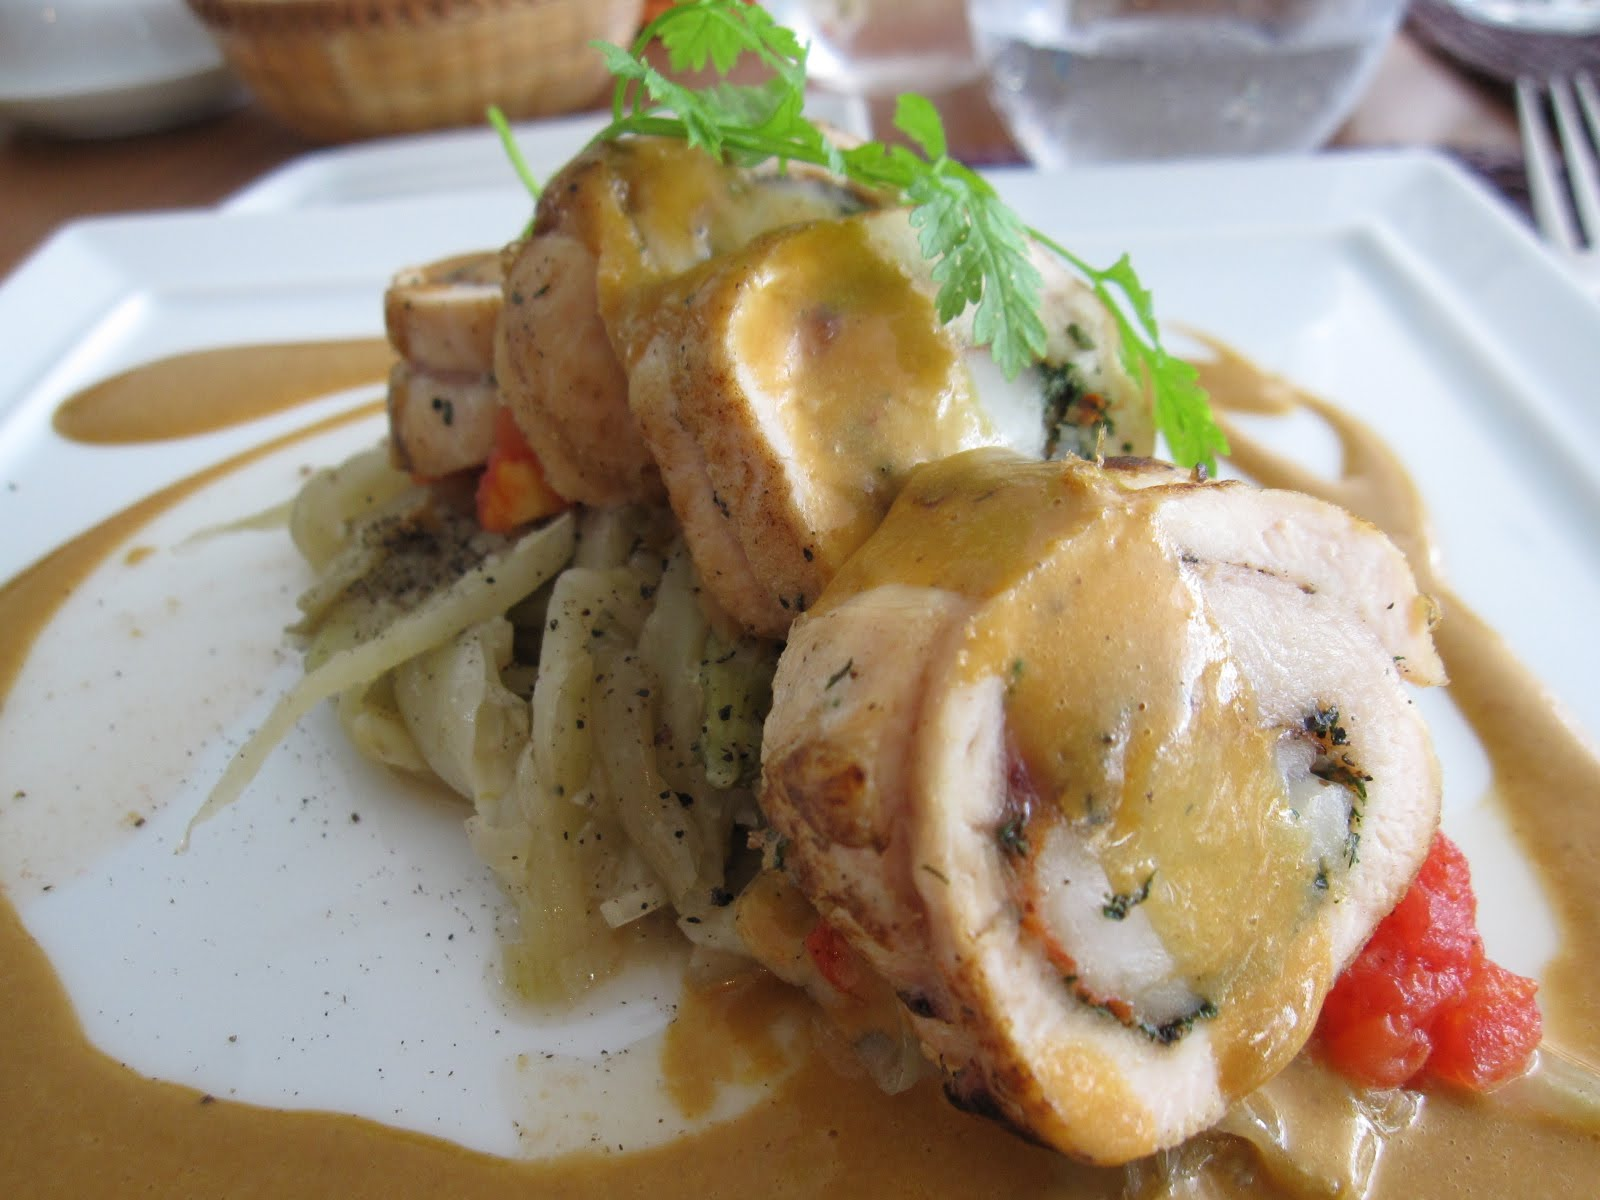 Thule food quest nathalie 39 s gourmet studio solaris dutamas for Cuisine gourmet by nathalie